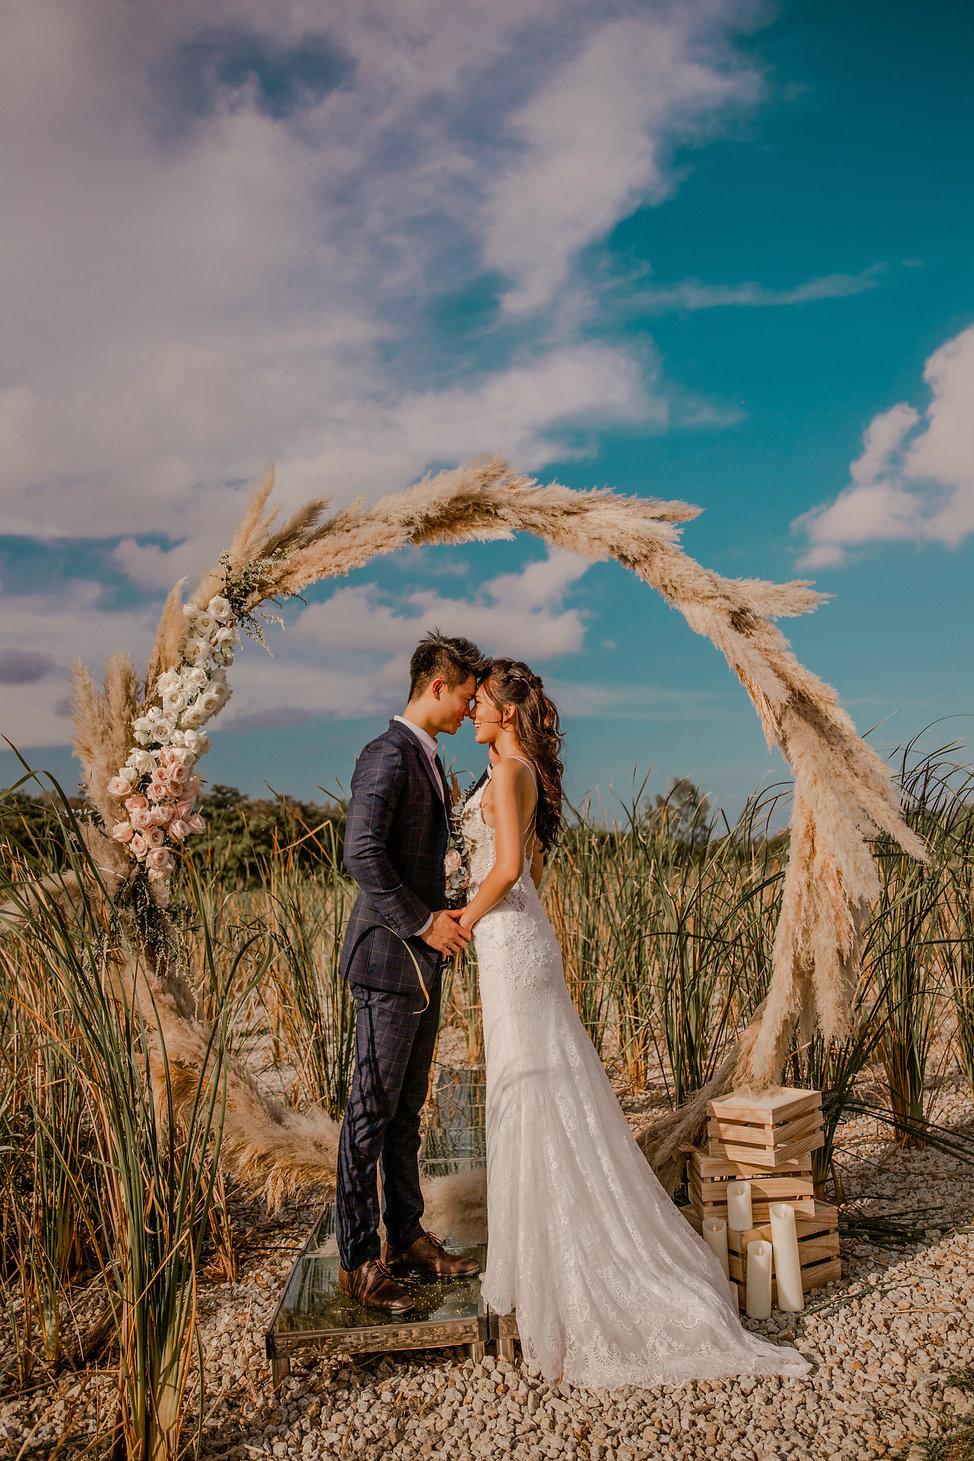 Arch wedding decoration photography